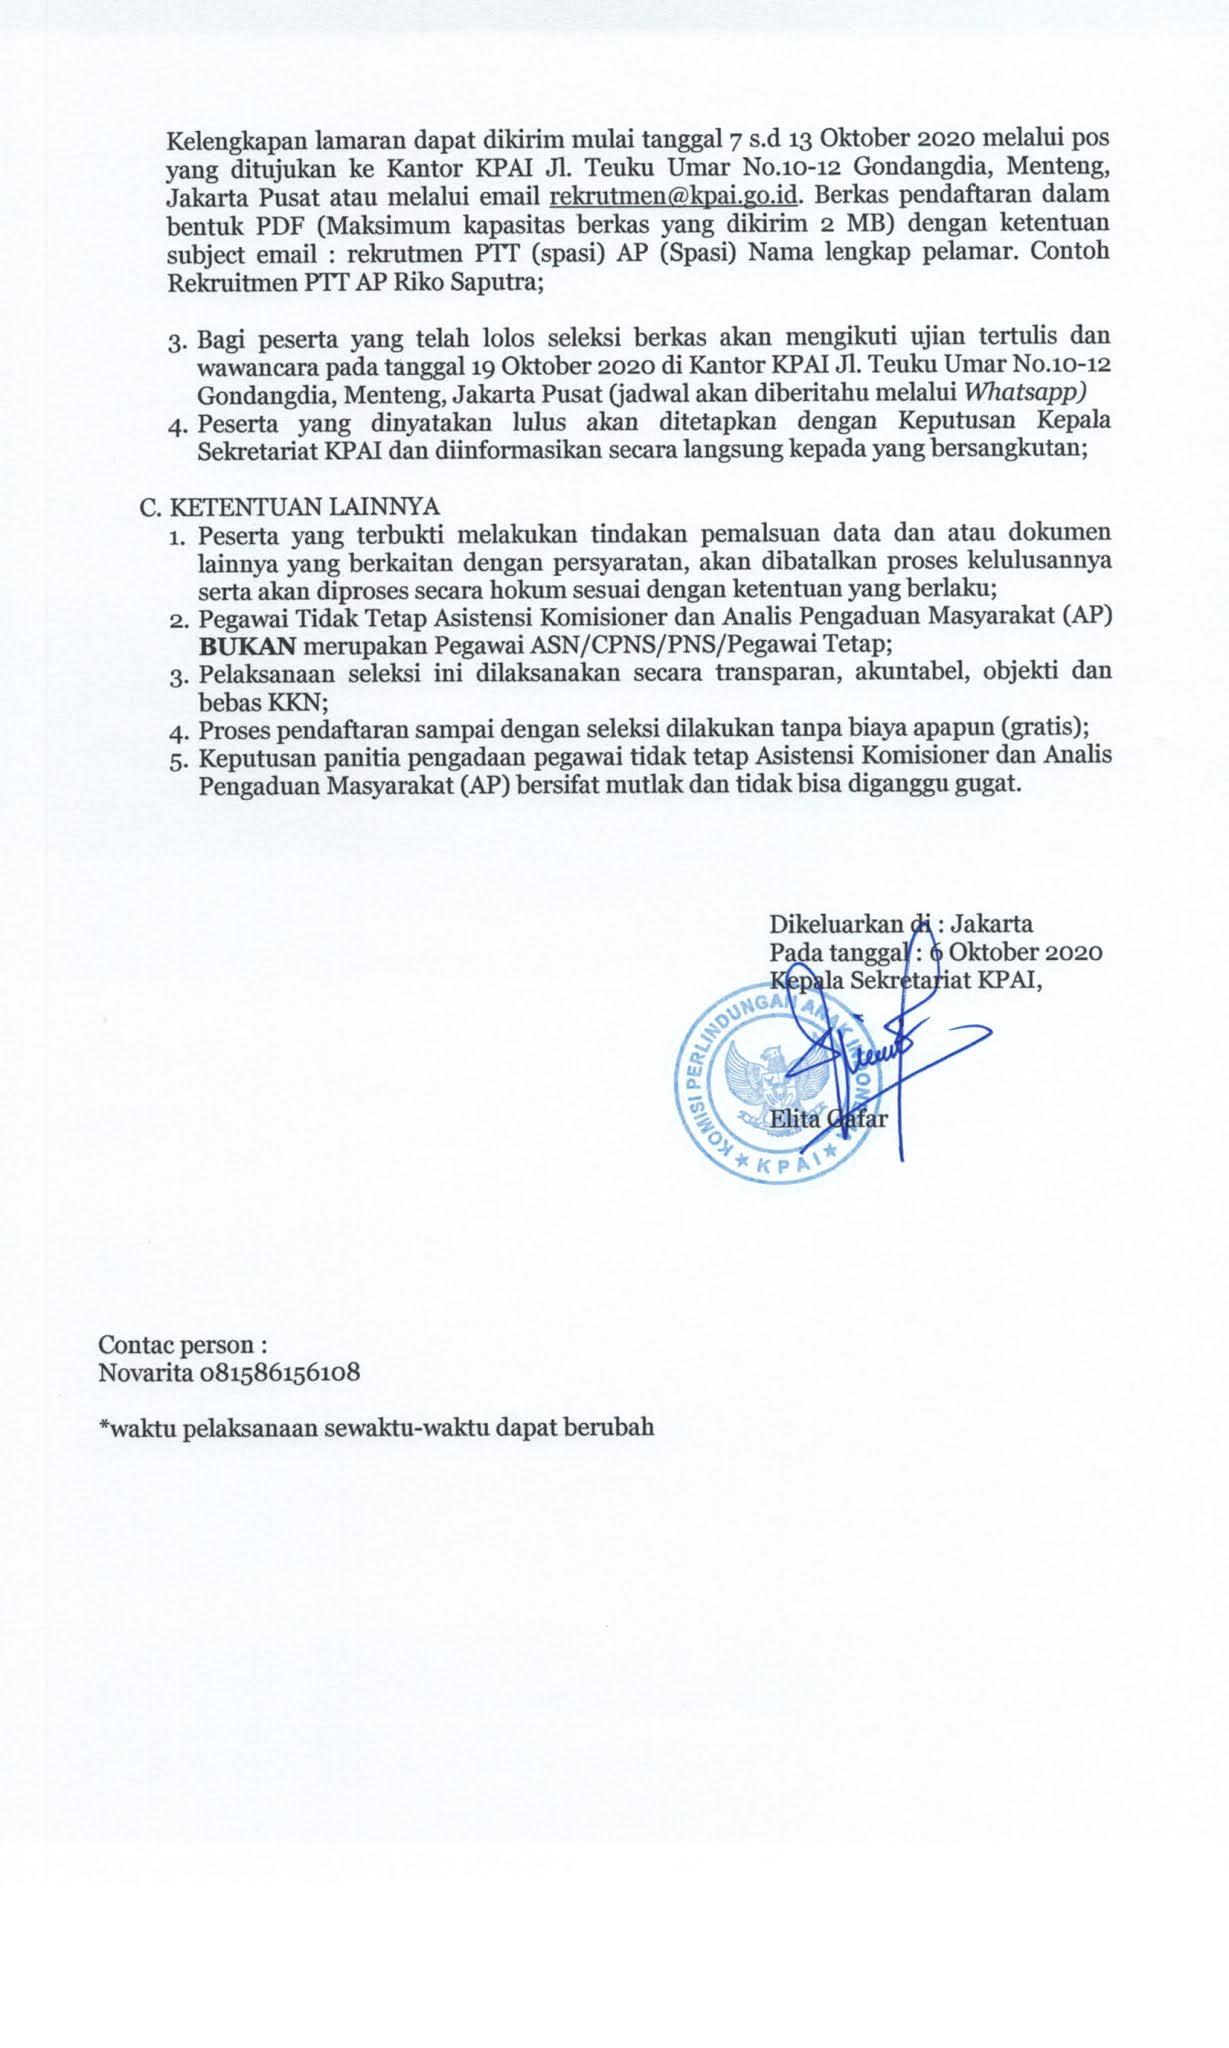 Lowongan Kerja Pegawai PTT Komisi Perlindungan Anak Indonesia Bulan Oktober 2020